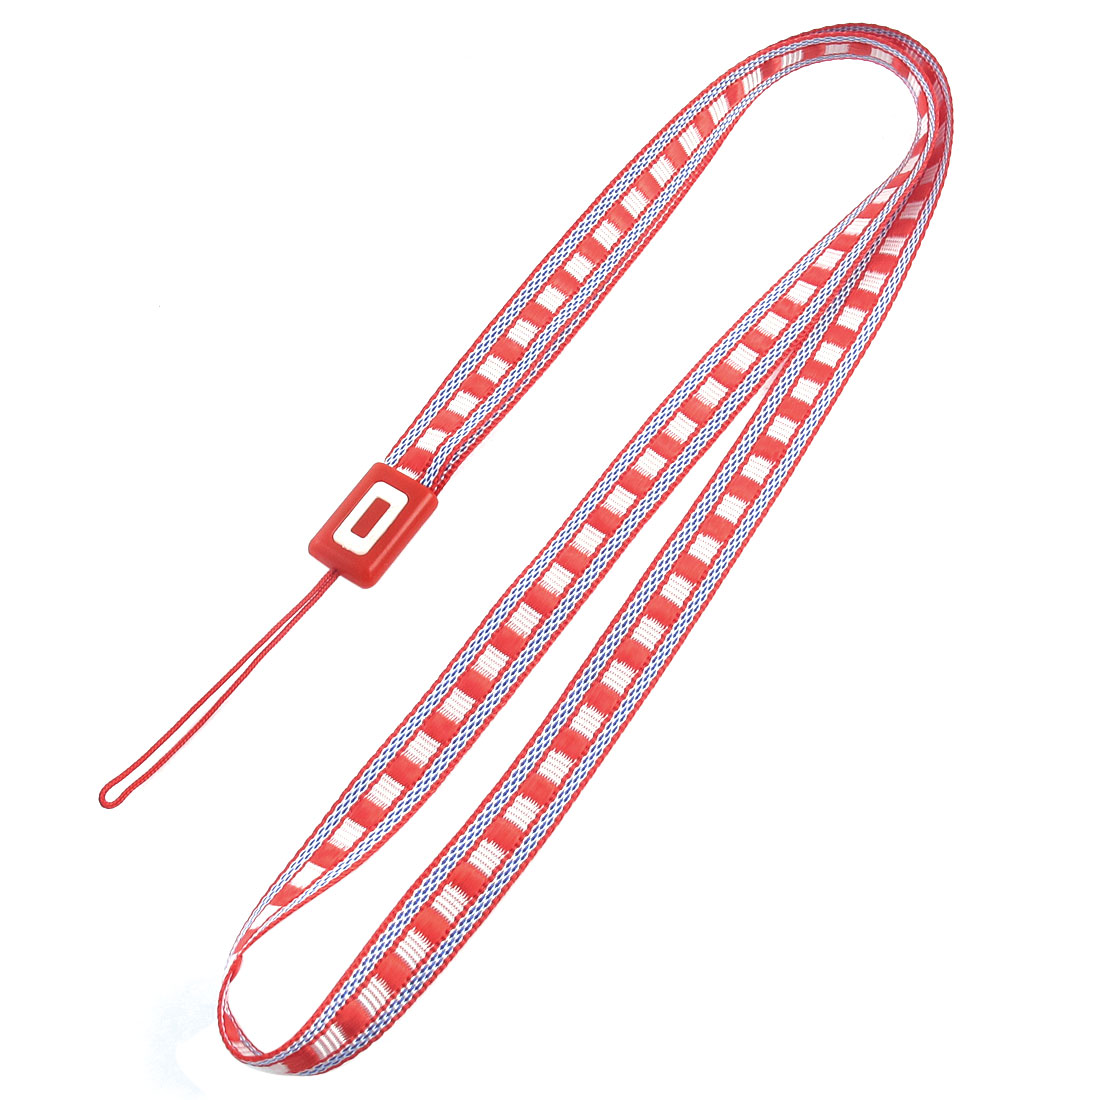 Fabric Plaid Pattern Cellphone MP4 Keyring String Strap Lanyard Red